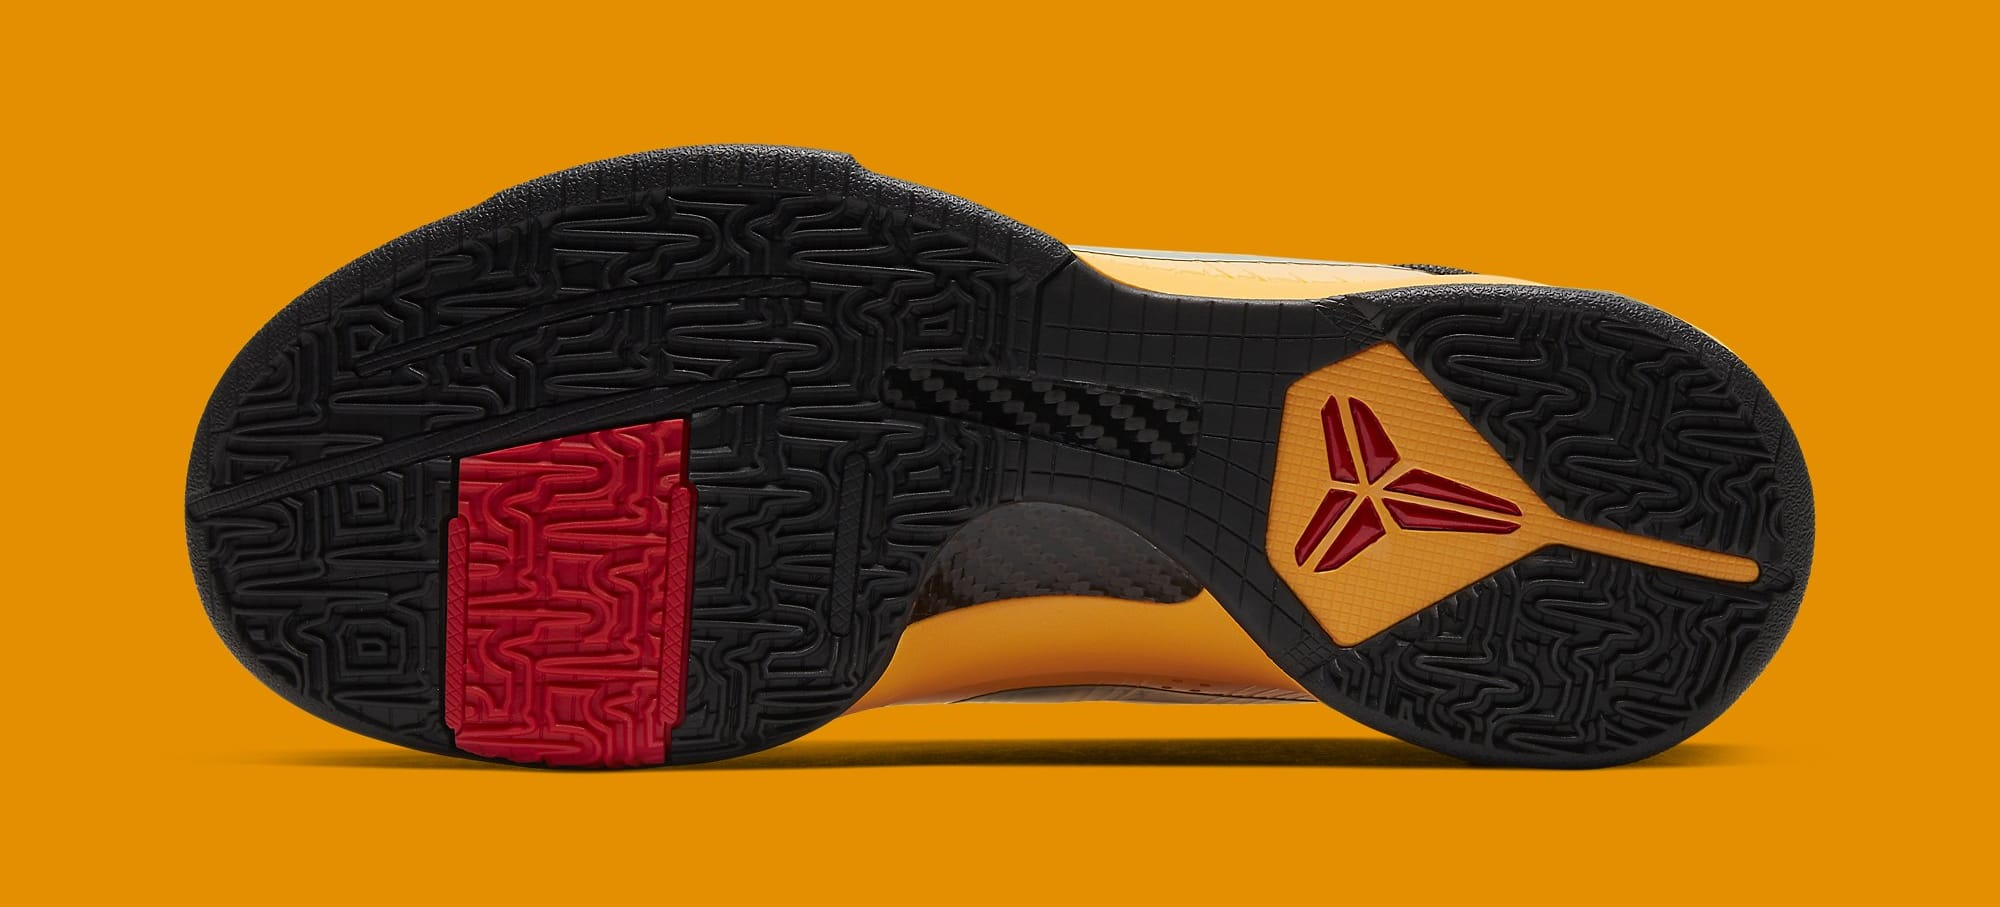 Nike Kobe 5 Protro 'Bruce Lee' CD4991-700 Outsole